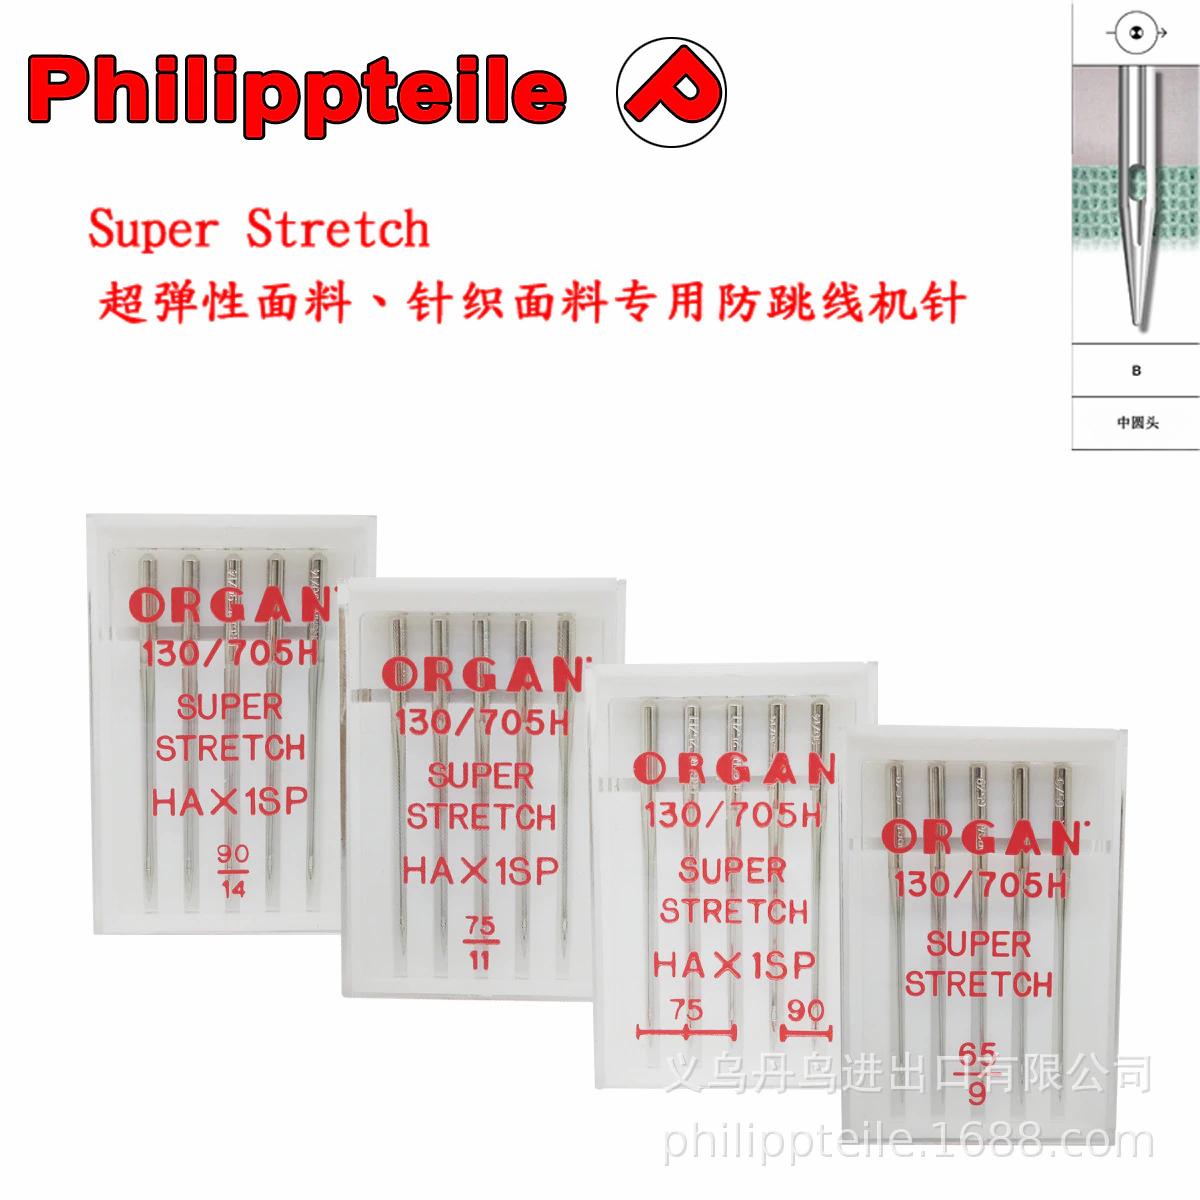 Organ needles super stretch